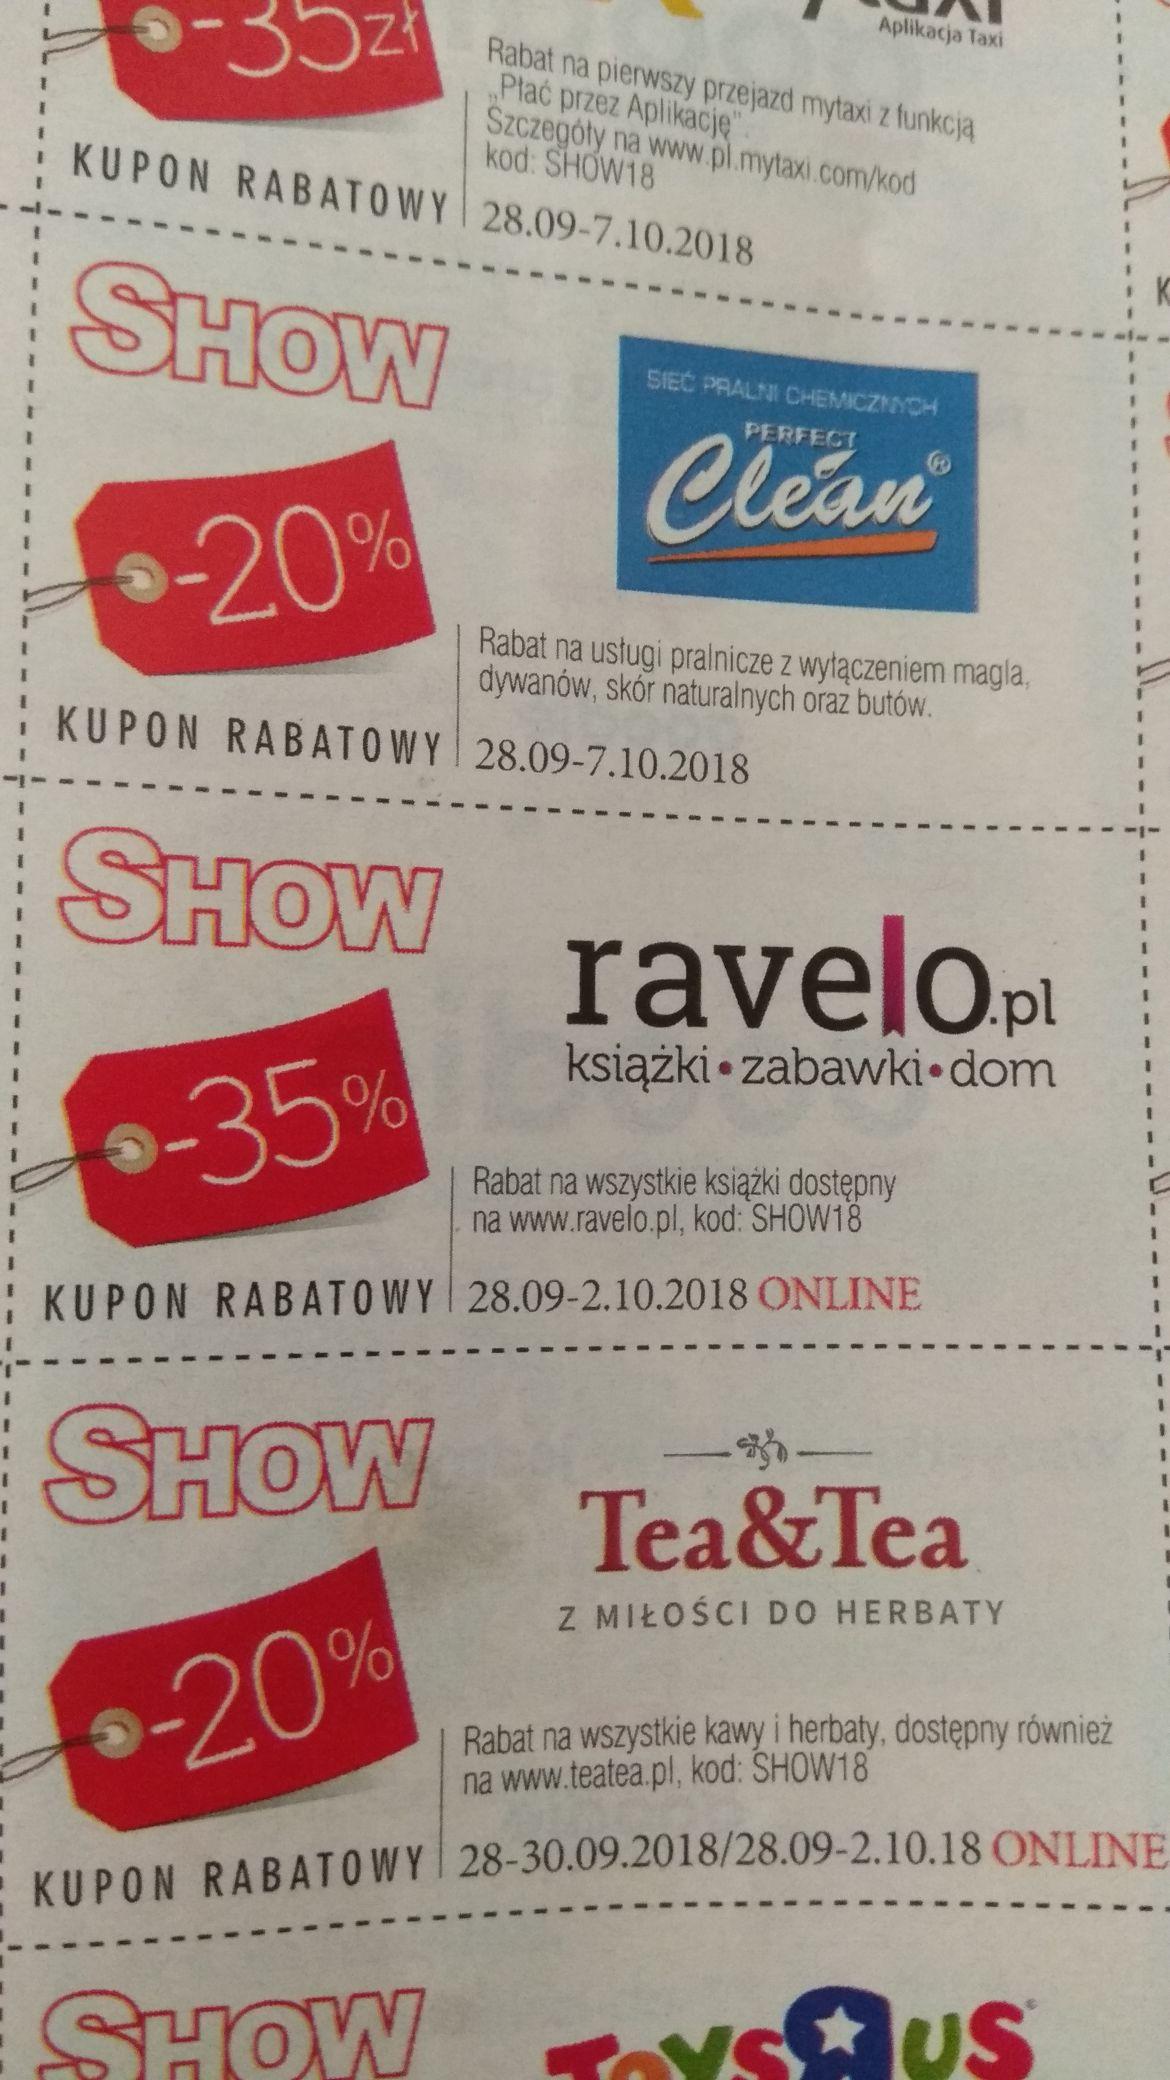 Ravelo masterpass -15zł + kod -35% na książki